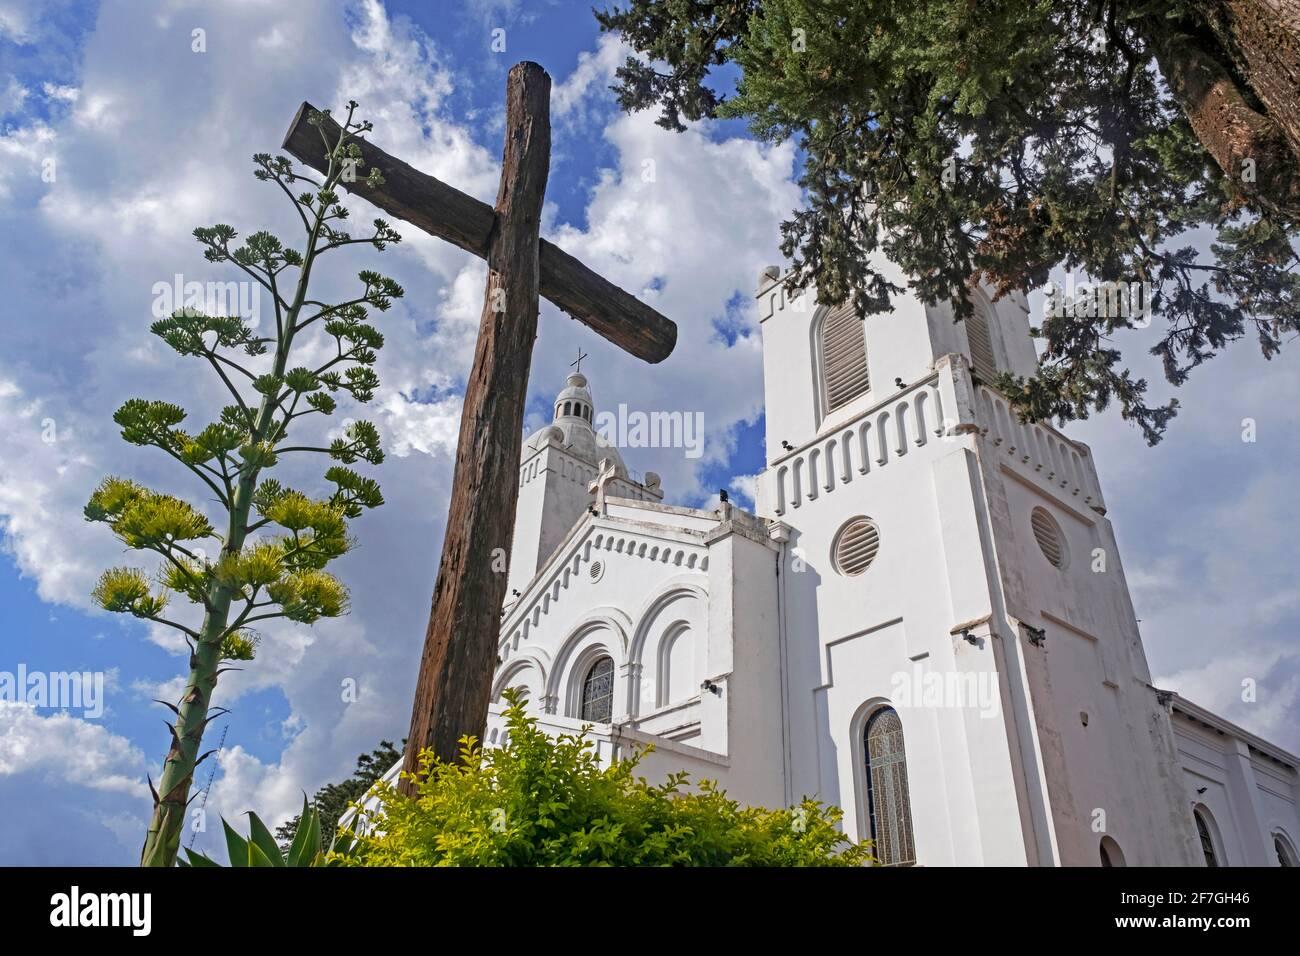 Cathedral of the Incarnation / Catedral de la Encarnación, Roman Catholic Church in the city Encarnacion, Itapúa, Paraguay Stock Photo